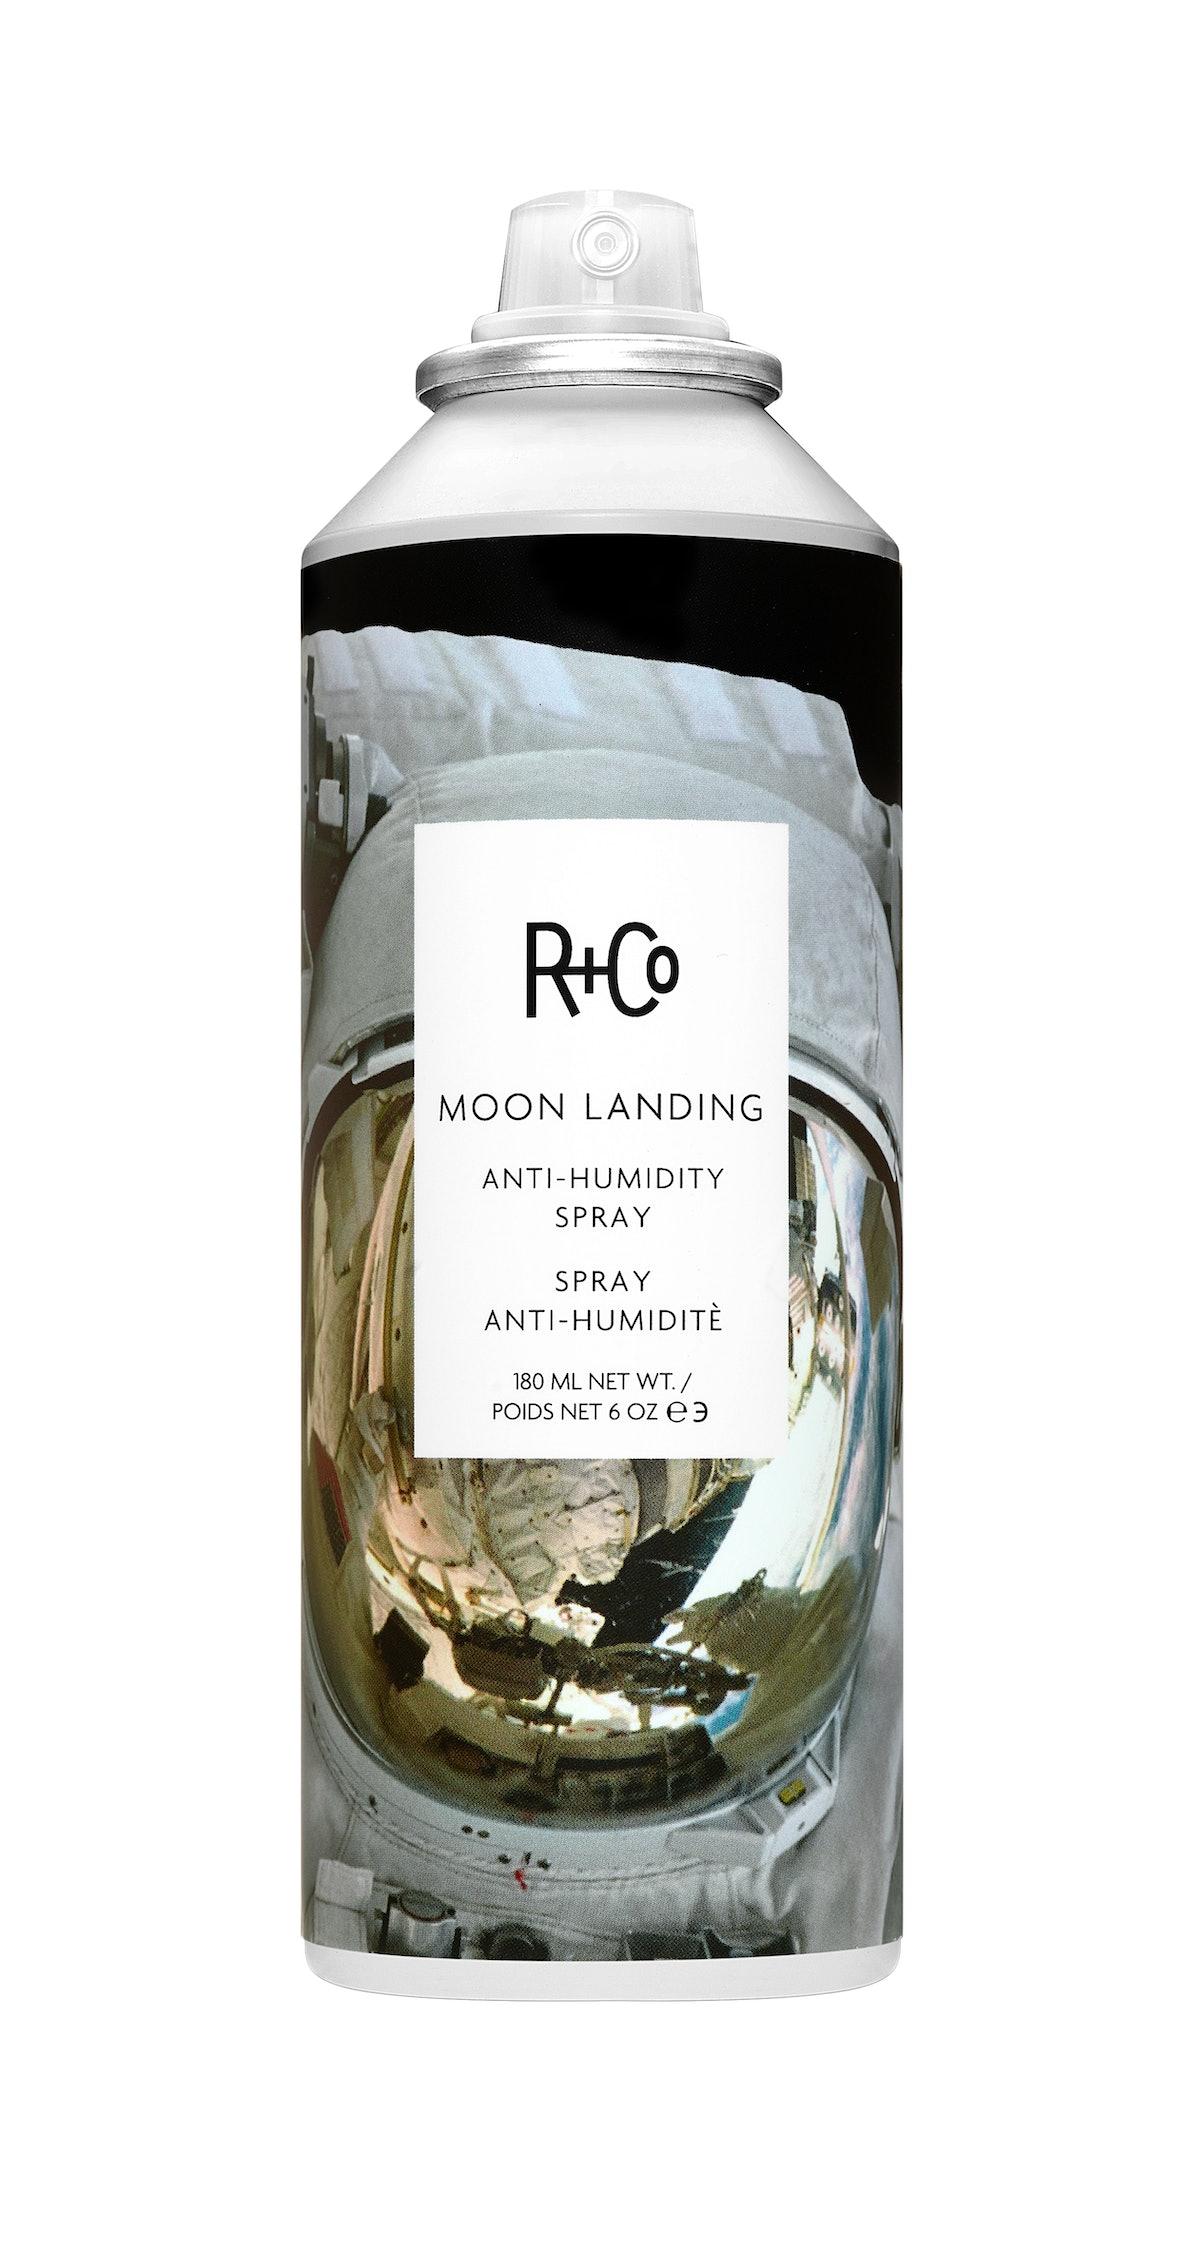 Moon Landing Anti-Humidity Spray